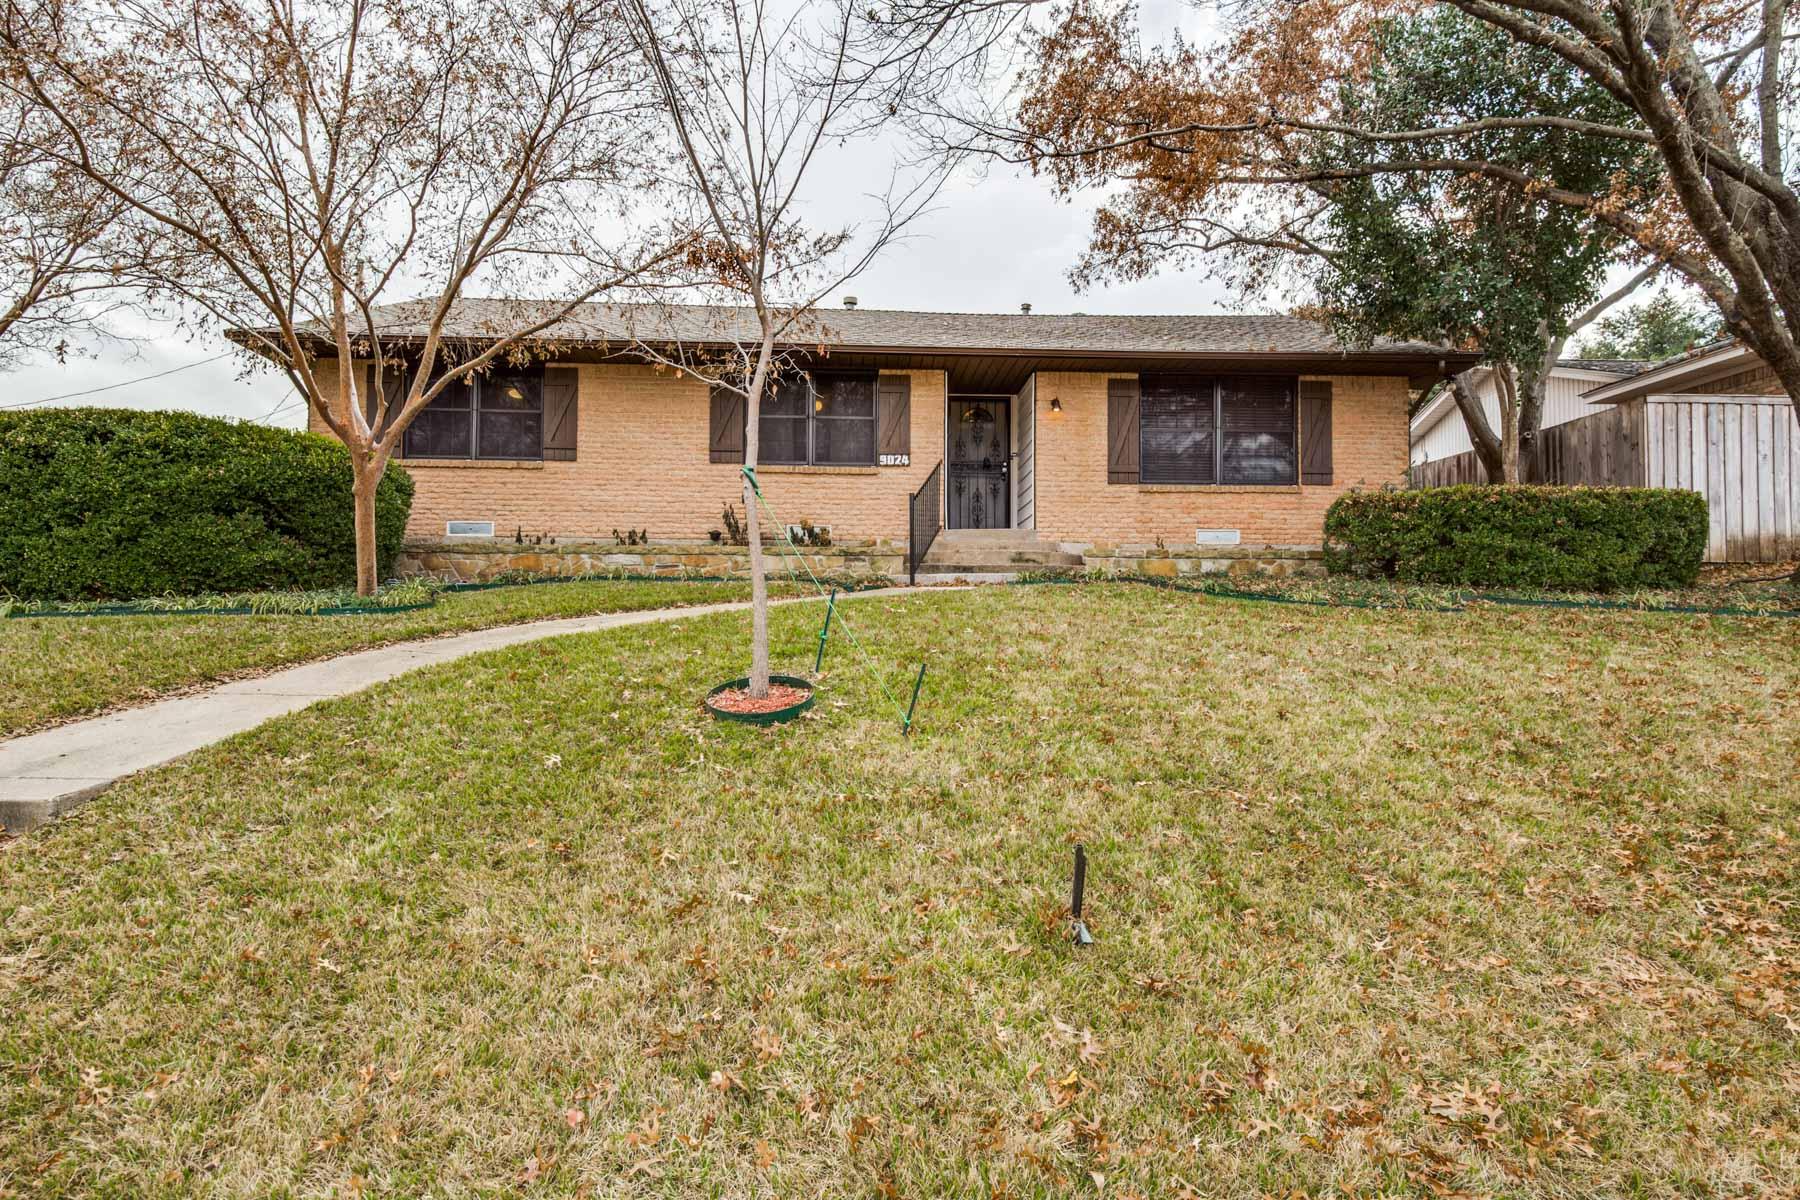 獨棟家庭住宅 為 出售 在 9024 Bretshire Drive, DALLAS Dallas, 德克薩斯州, 75228 美國